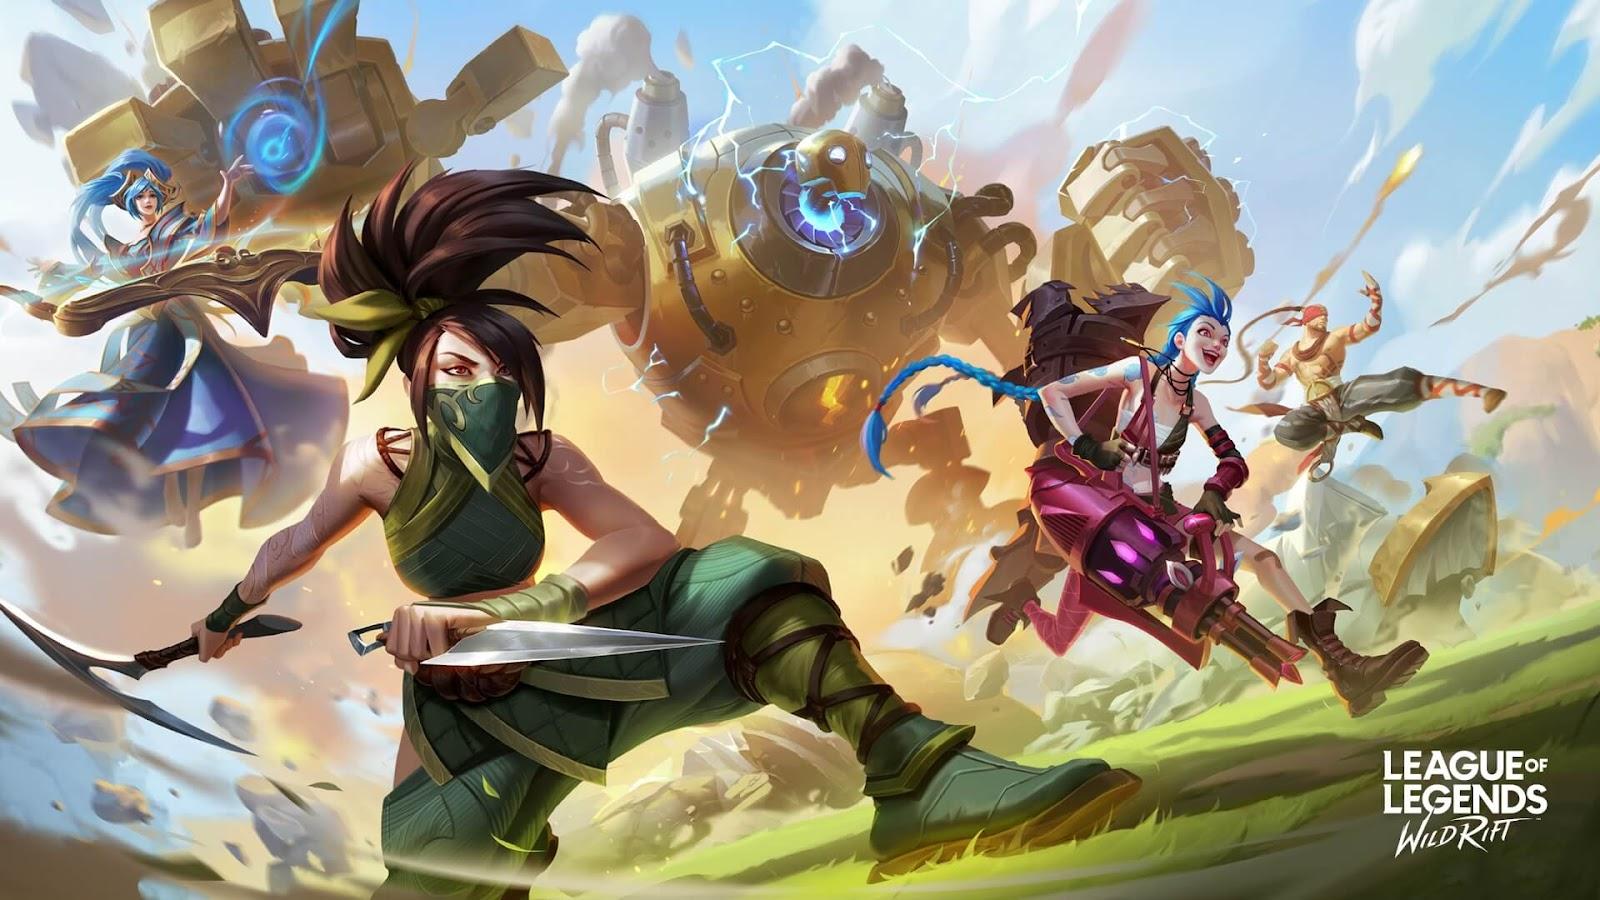 Online Mobile Games - League of Legends: Wild Rift